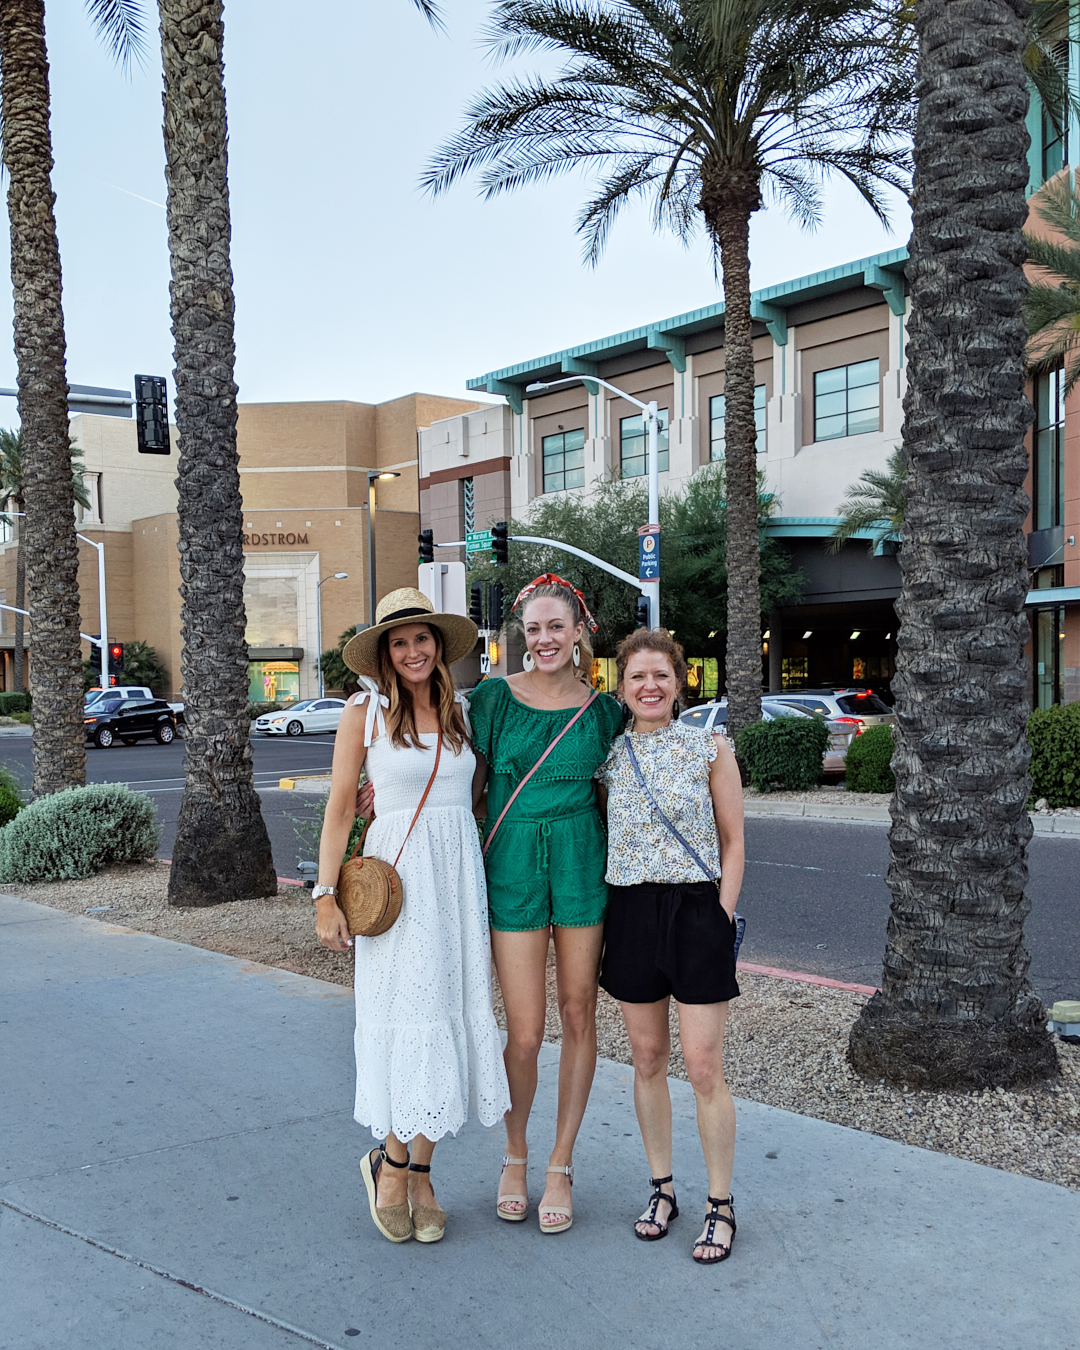 Jennifer, Erika and I standing outside of Fashion Square